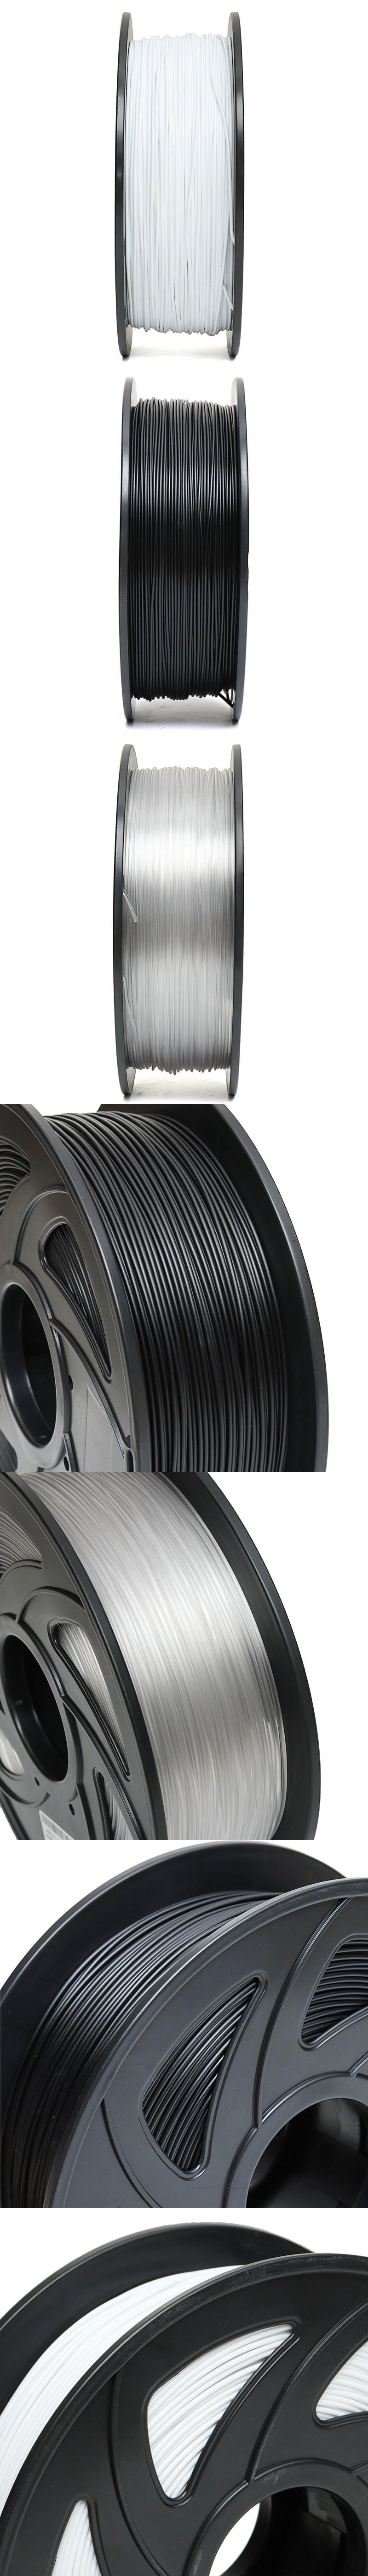 1KG 1.75mm PETG Filament Black White or Nude Color New Filament for 3D Printer 23